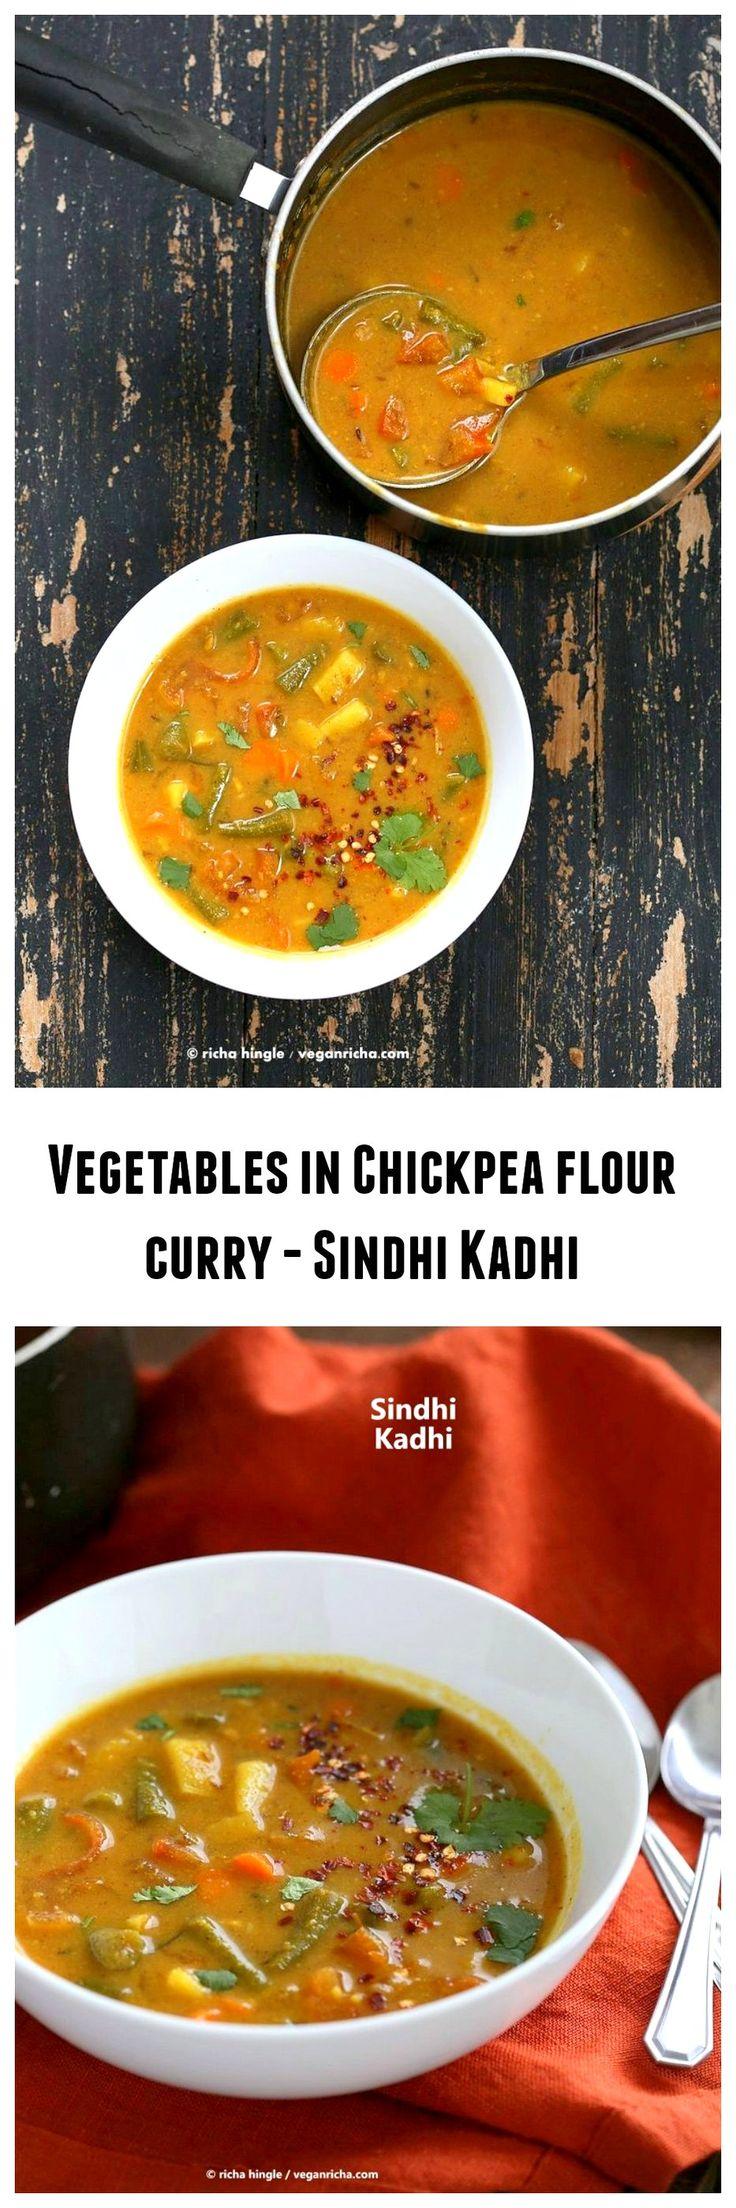 Vegetables in Chickpea flour Sauce - Sindhi Kadhi   VeganRicha.com #vegan #Indian #main #soyfree #glutenfree #recipe #chickpeaflour